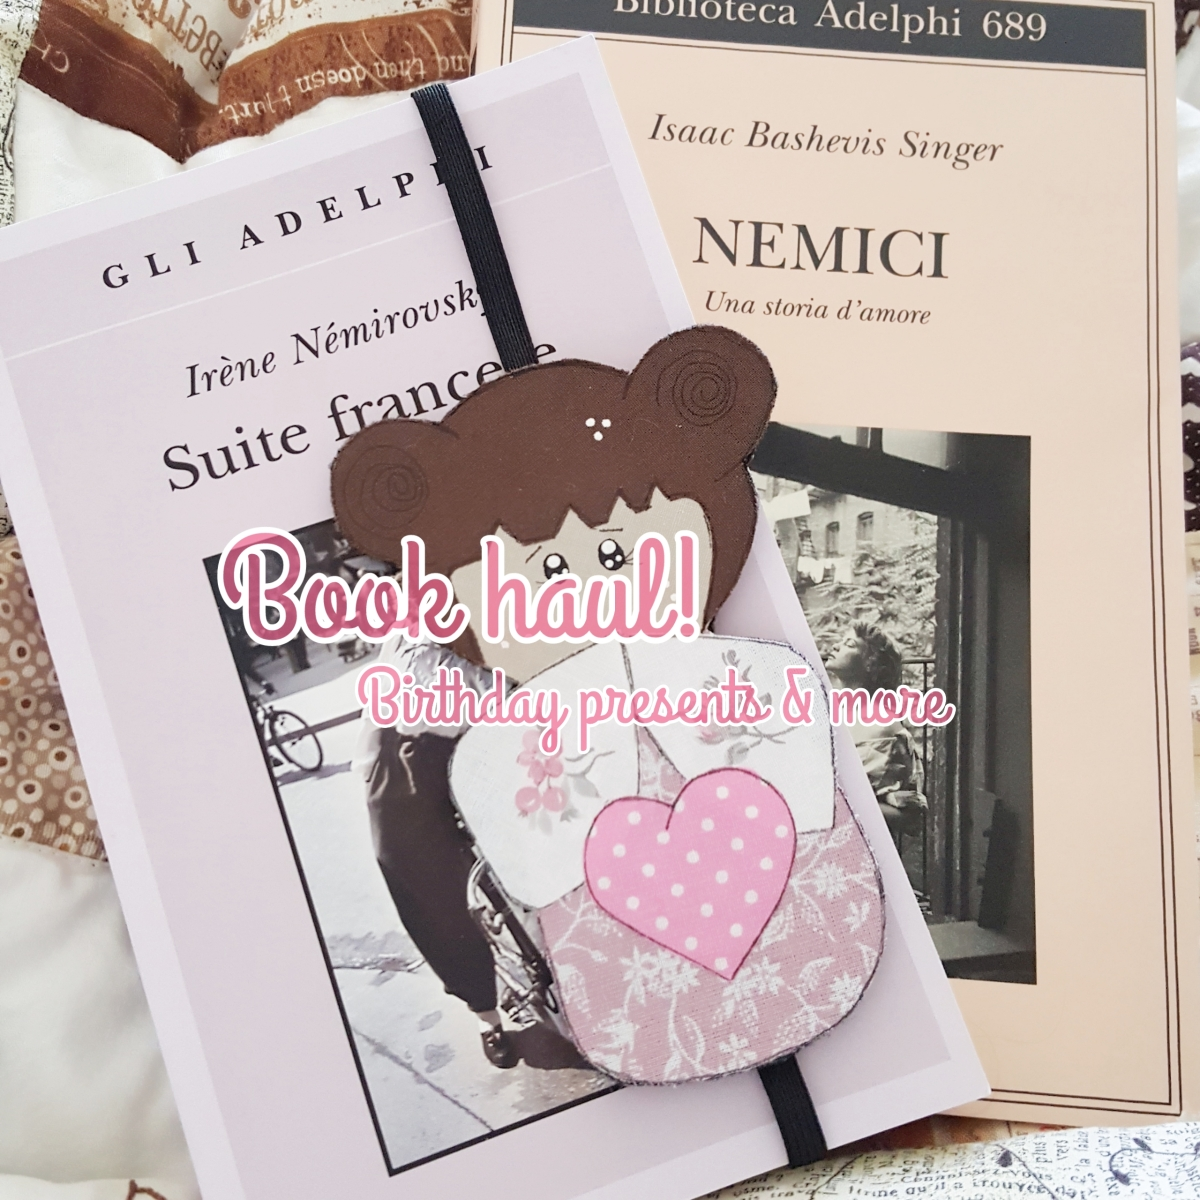 Book Haul | Birthday presents & more